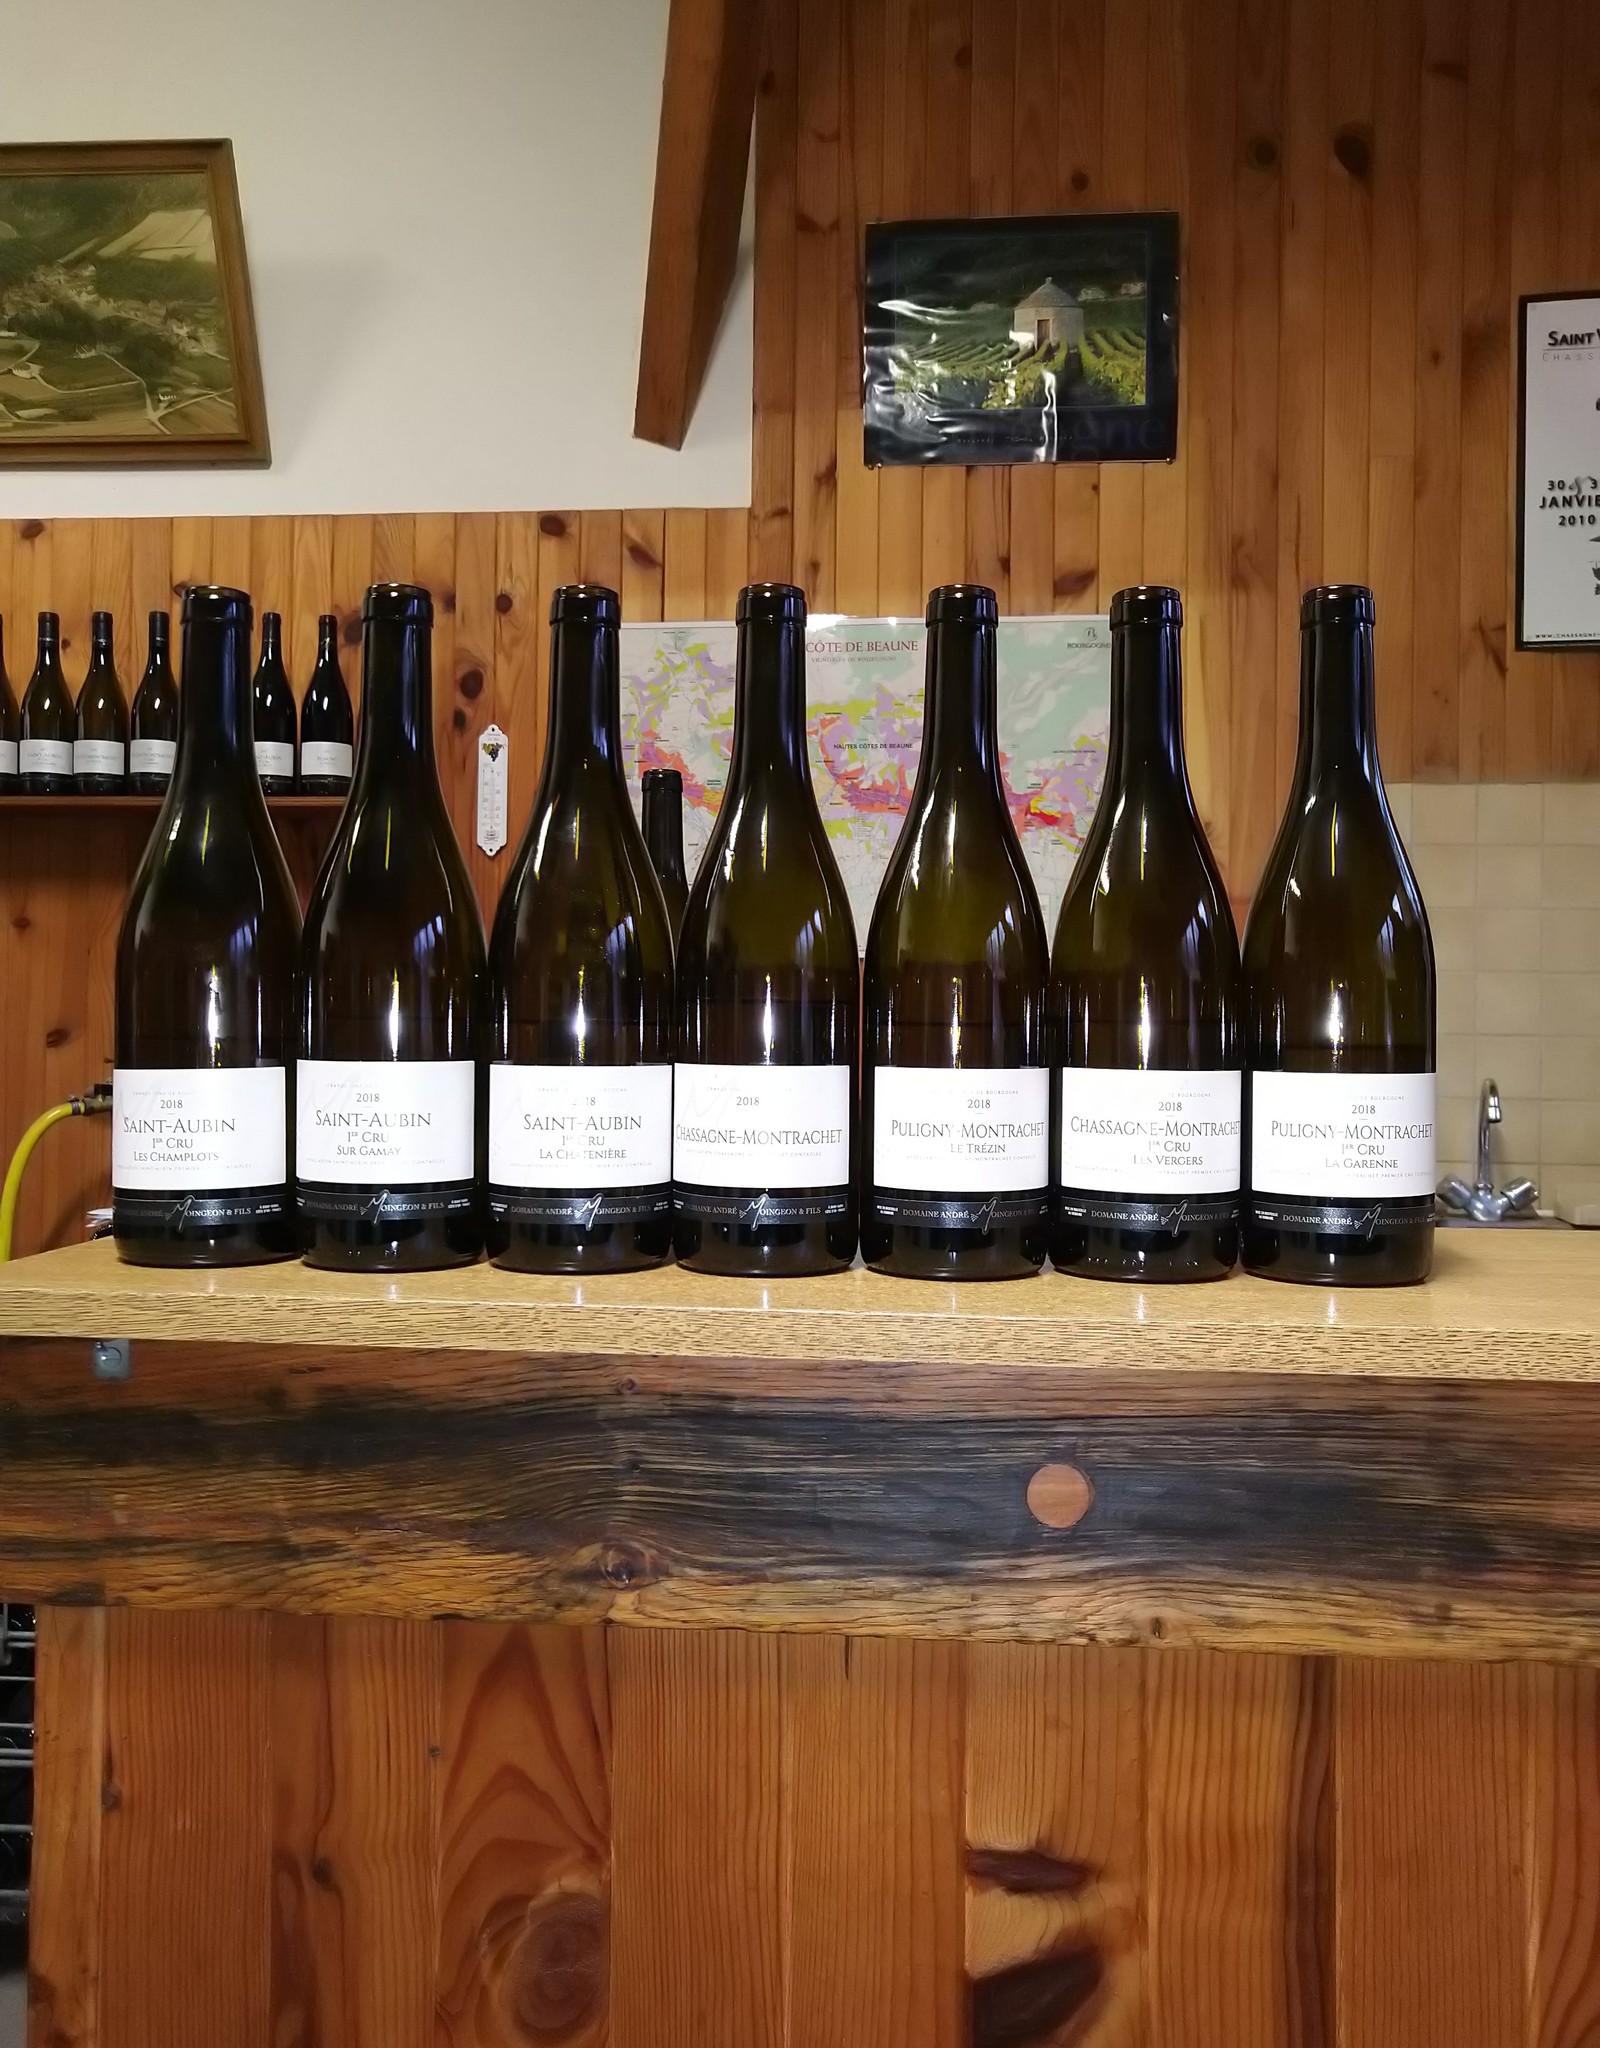 2016 Domaine Moingeon Puligny-Montrachet 1er Cru La Garenne